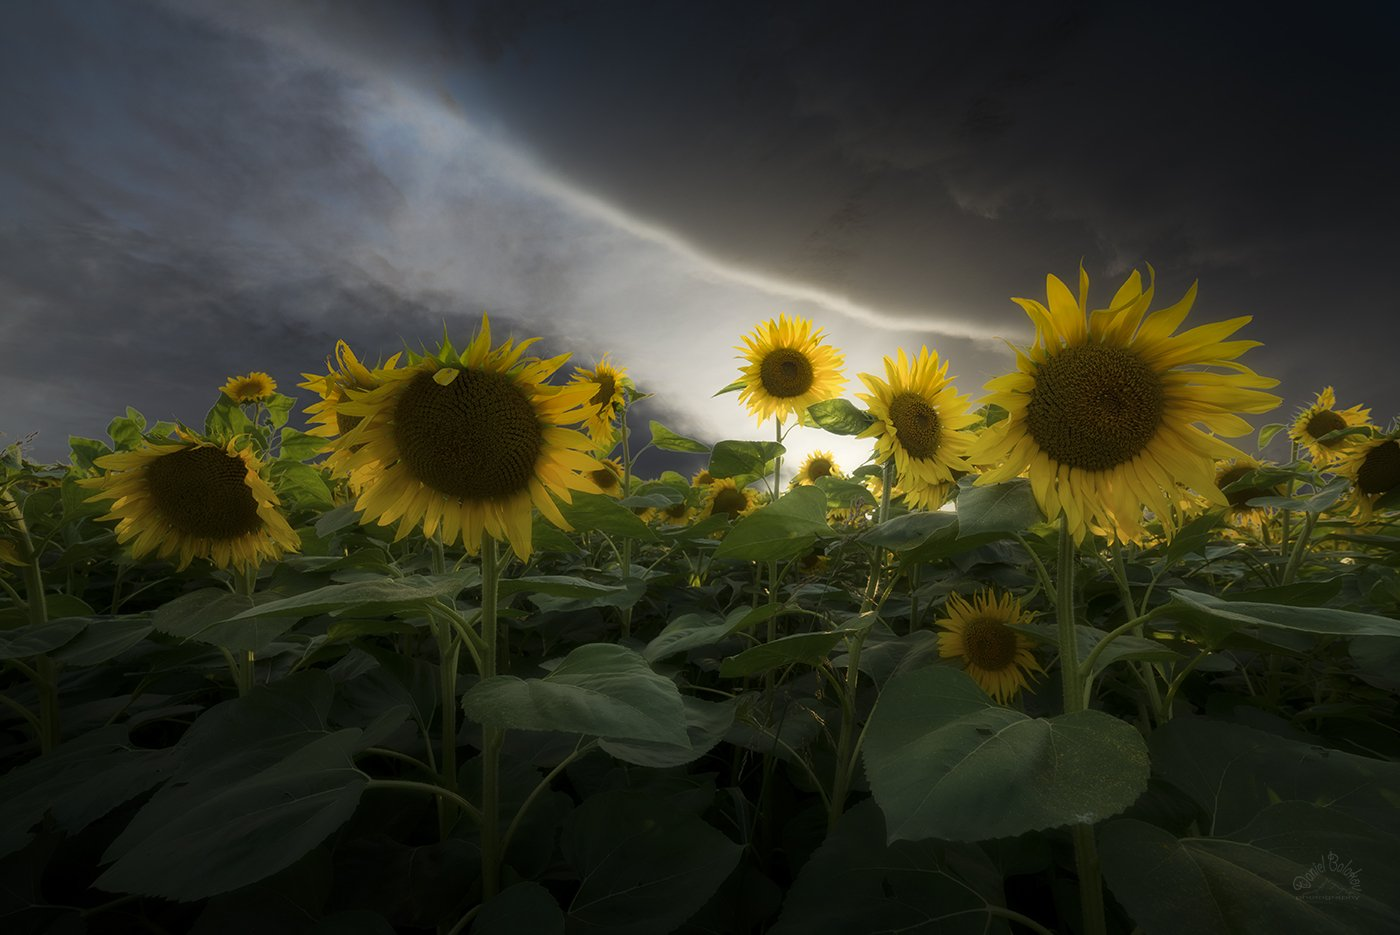 sunflowers, Даниел Балъков